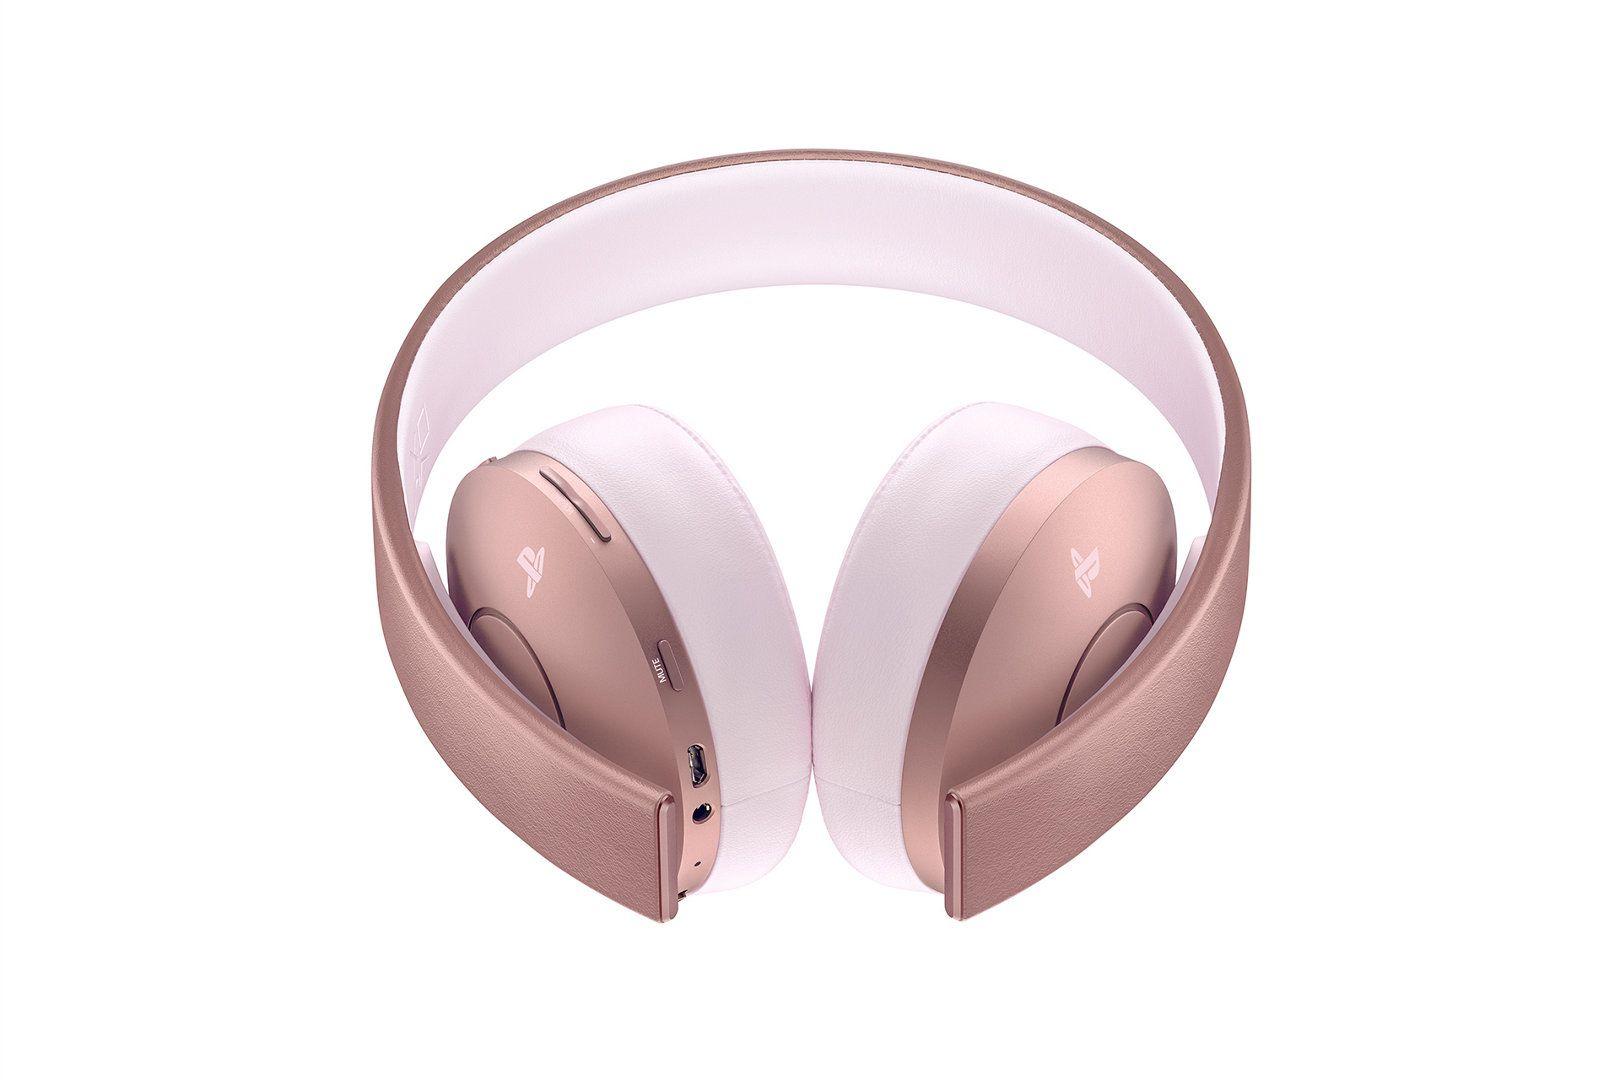 Novo Headset Sony Gold Wireless Rosa